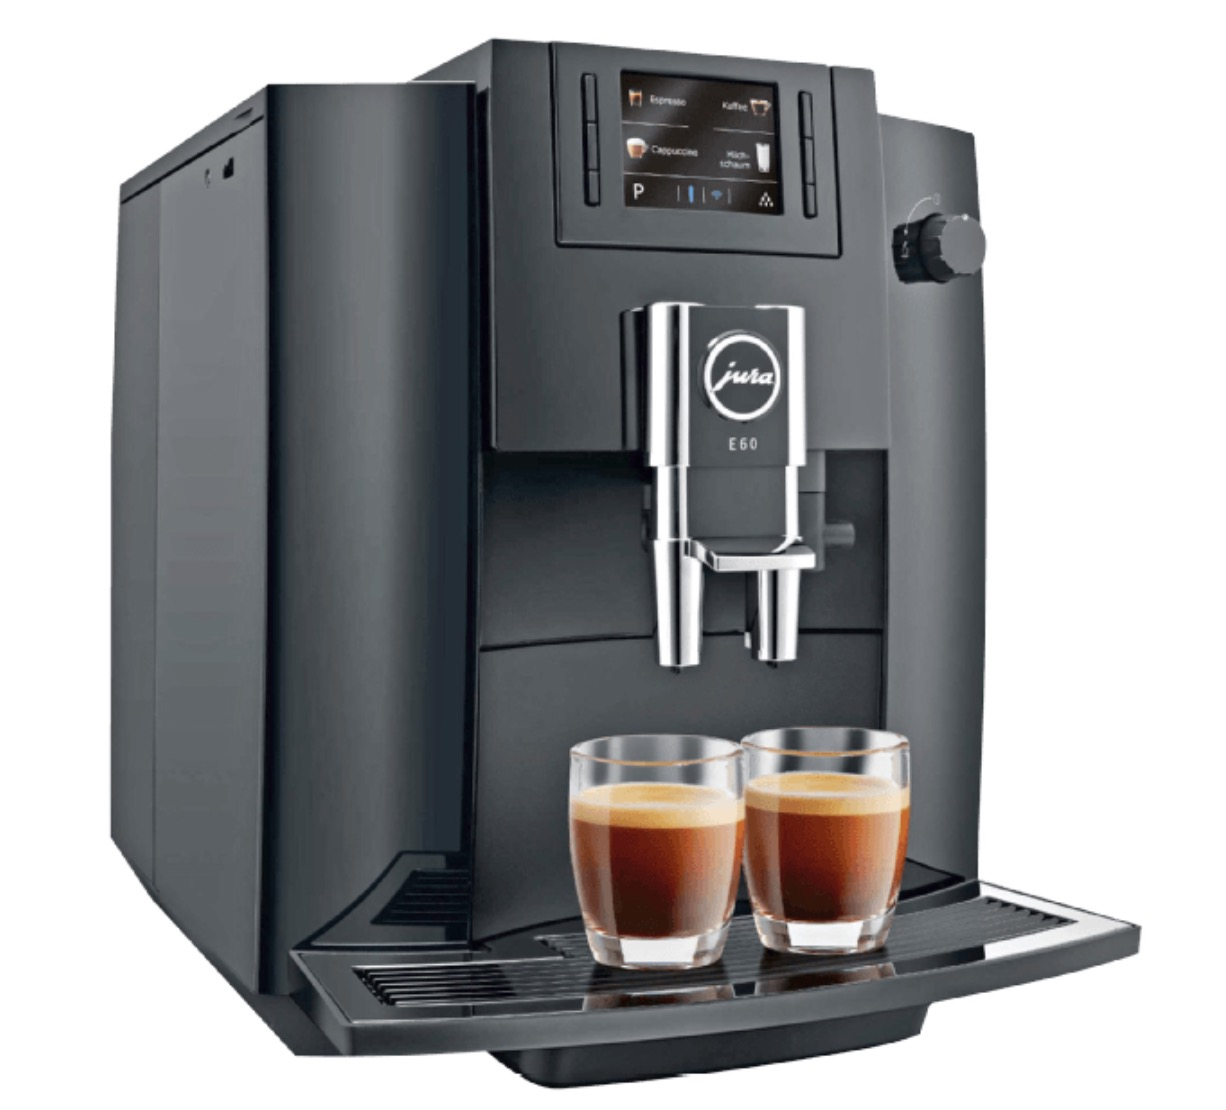 JURA E60 Kaffeevollautomat Piano Black für nur 609,19 Euro inkl. Versand